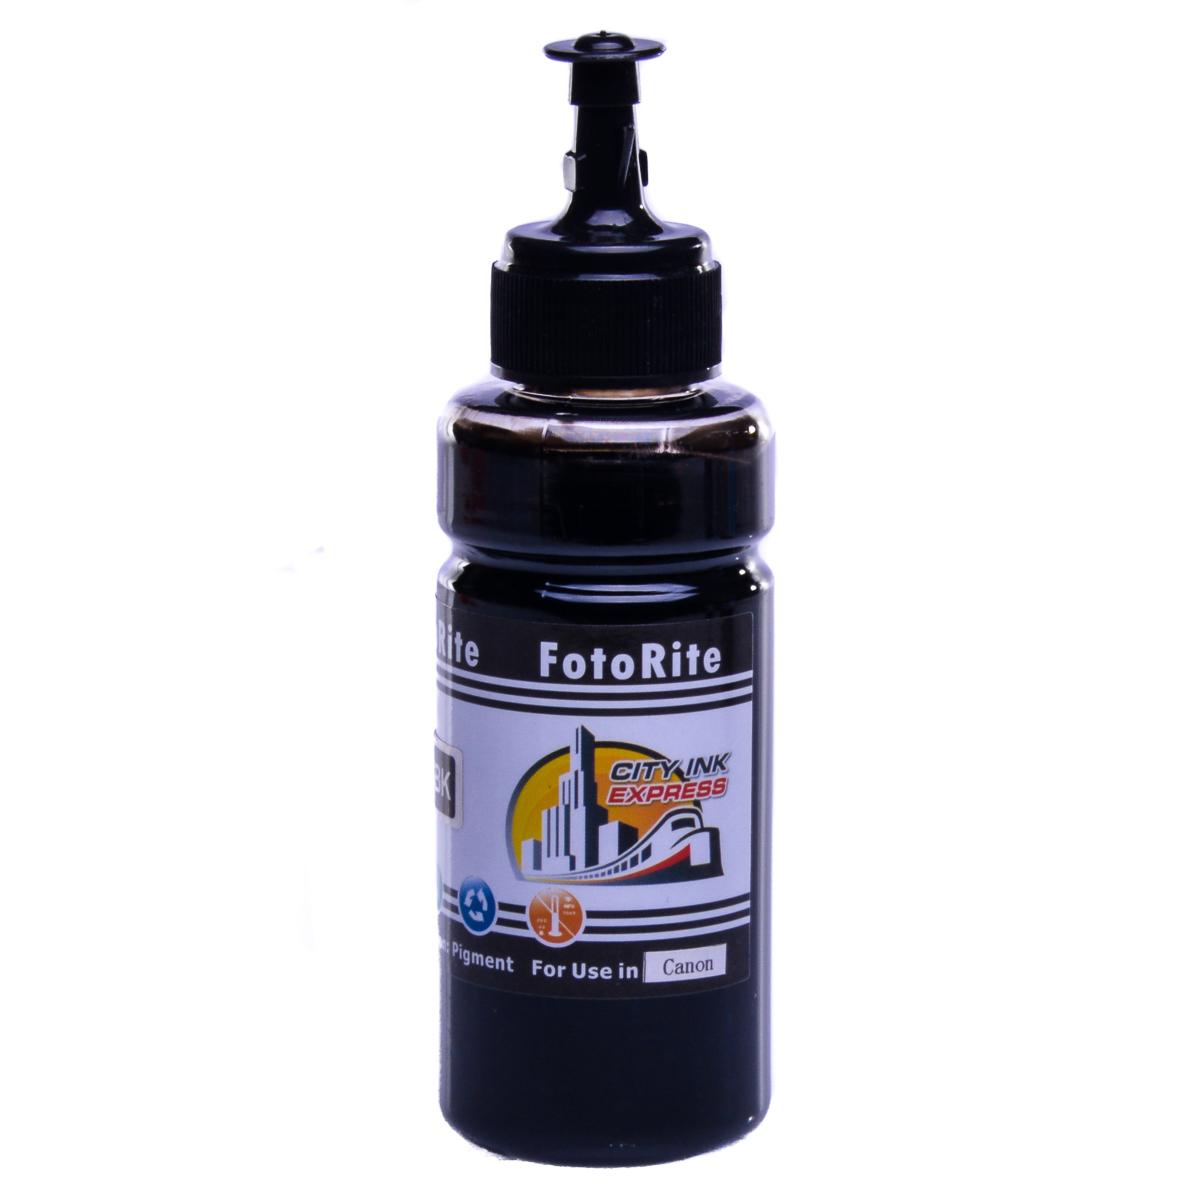 Cheap Pigment Black pigment ink replaces Canon Pixma TS8351 - PGI-580PGBK